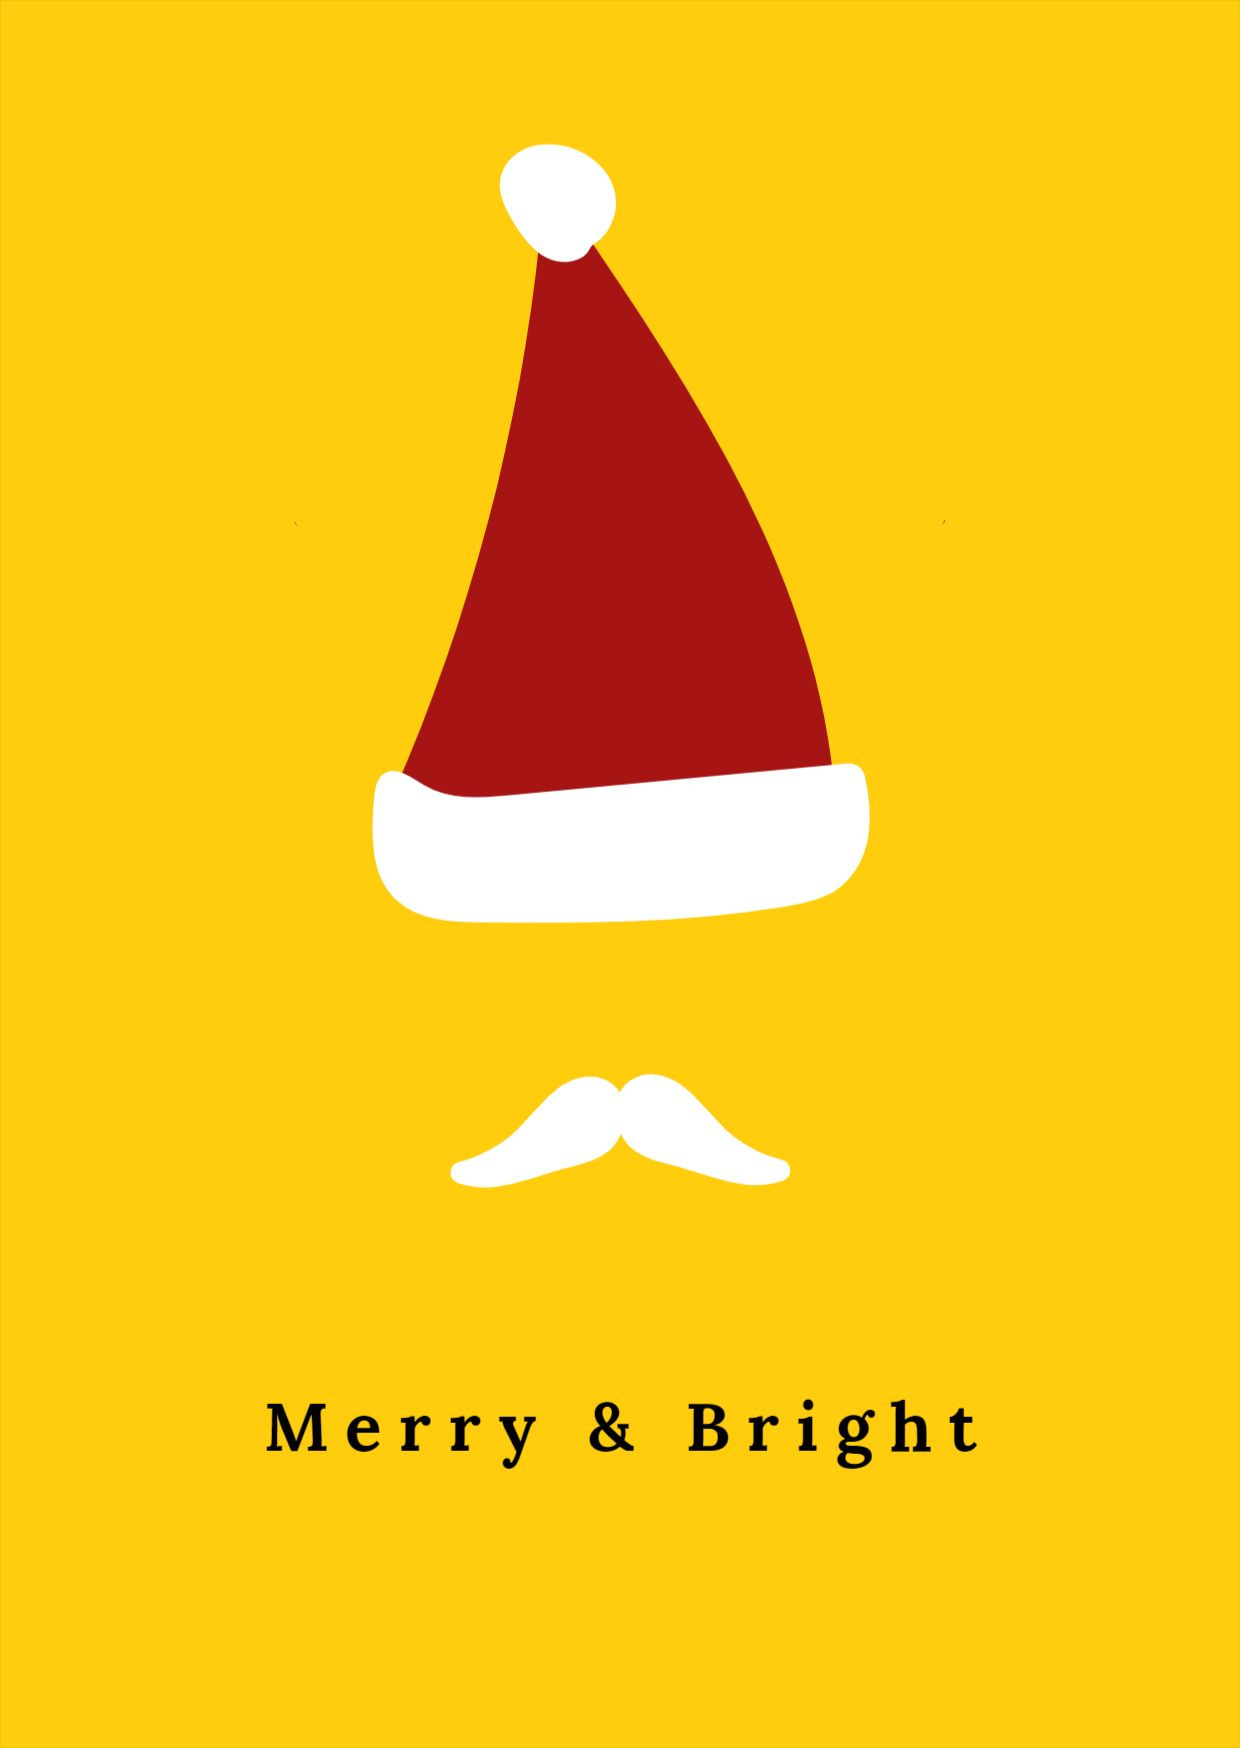 Minimalist Christmas Greeting Card Template